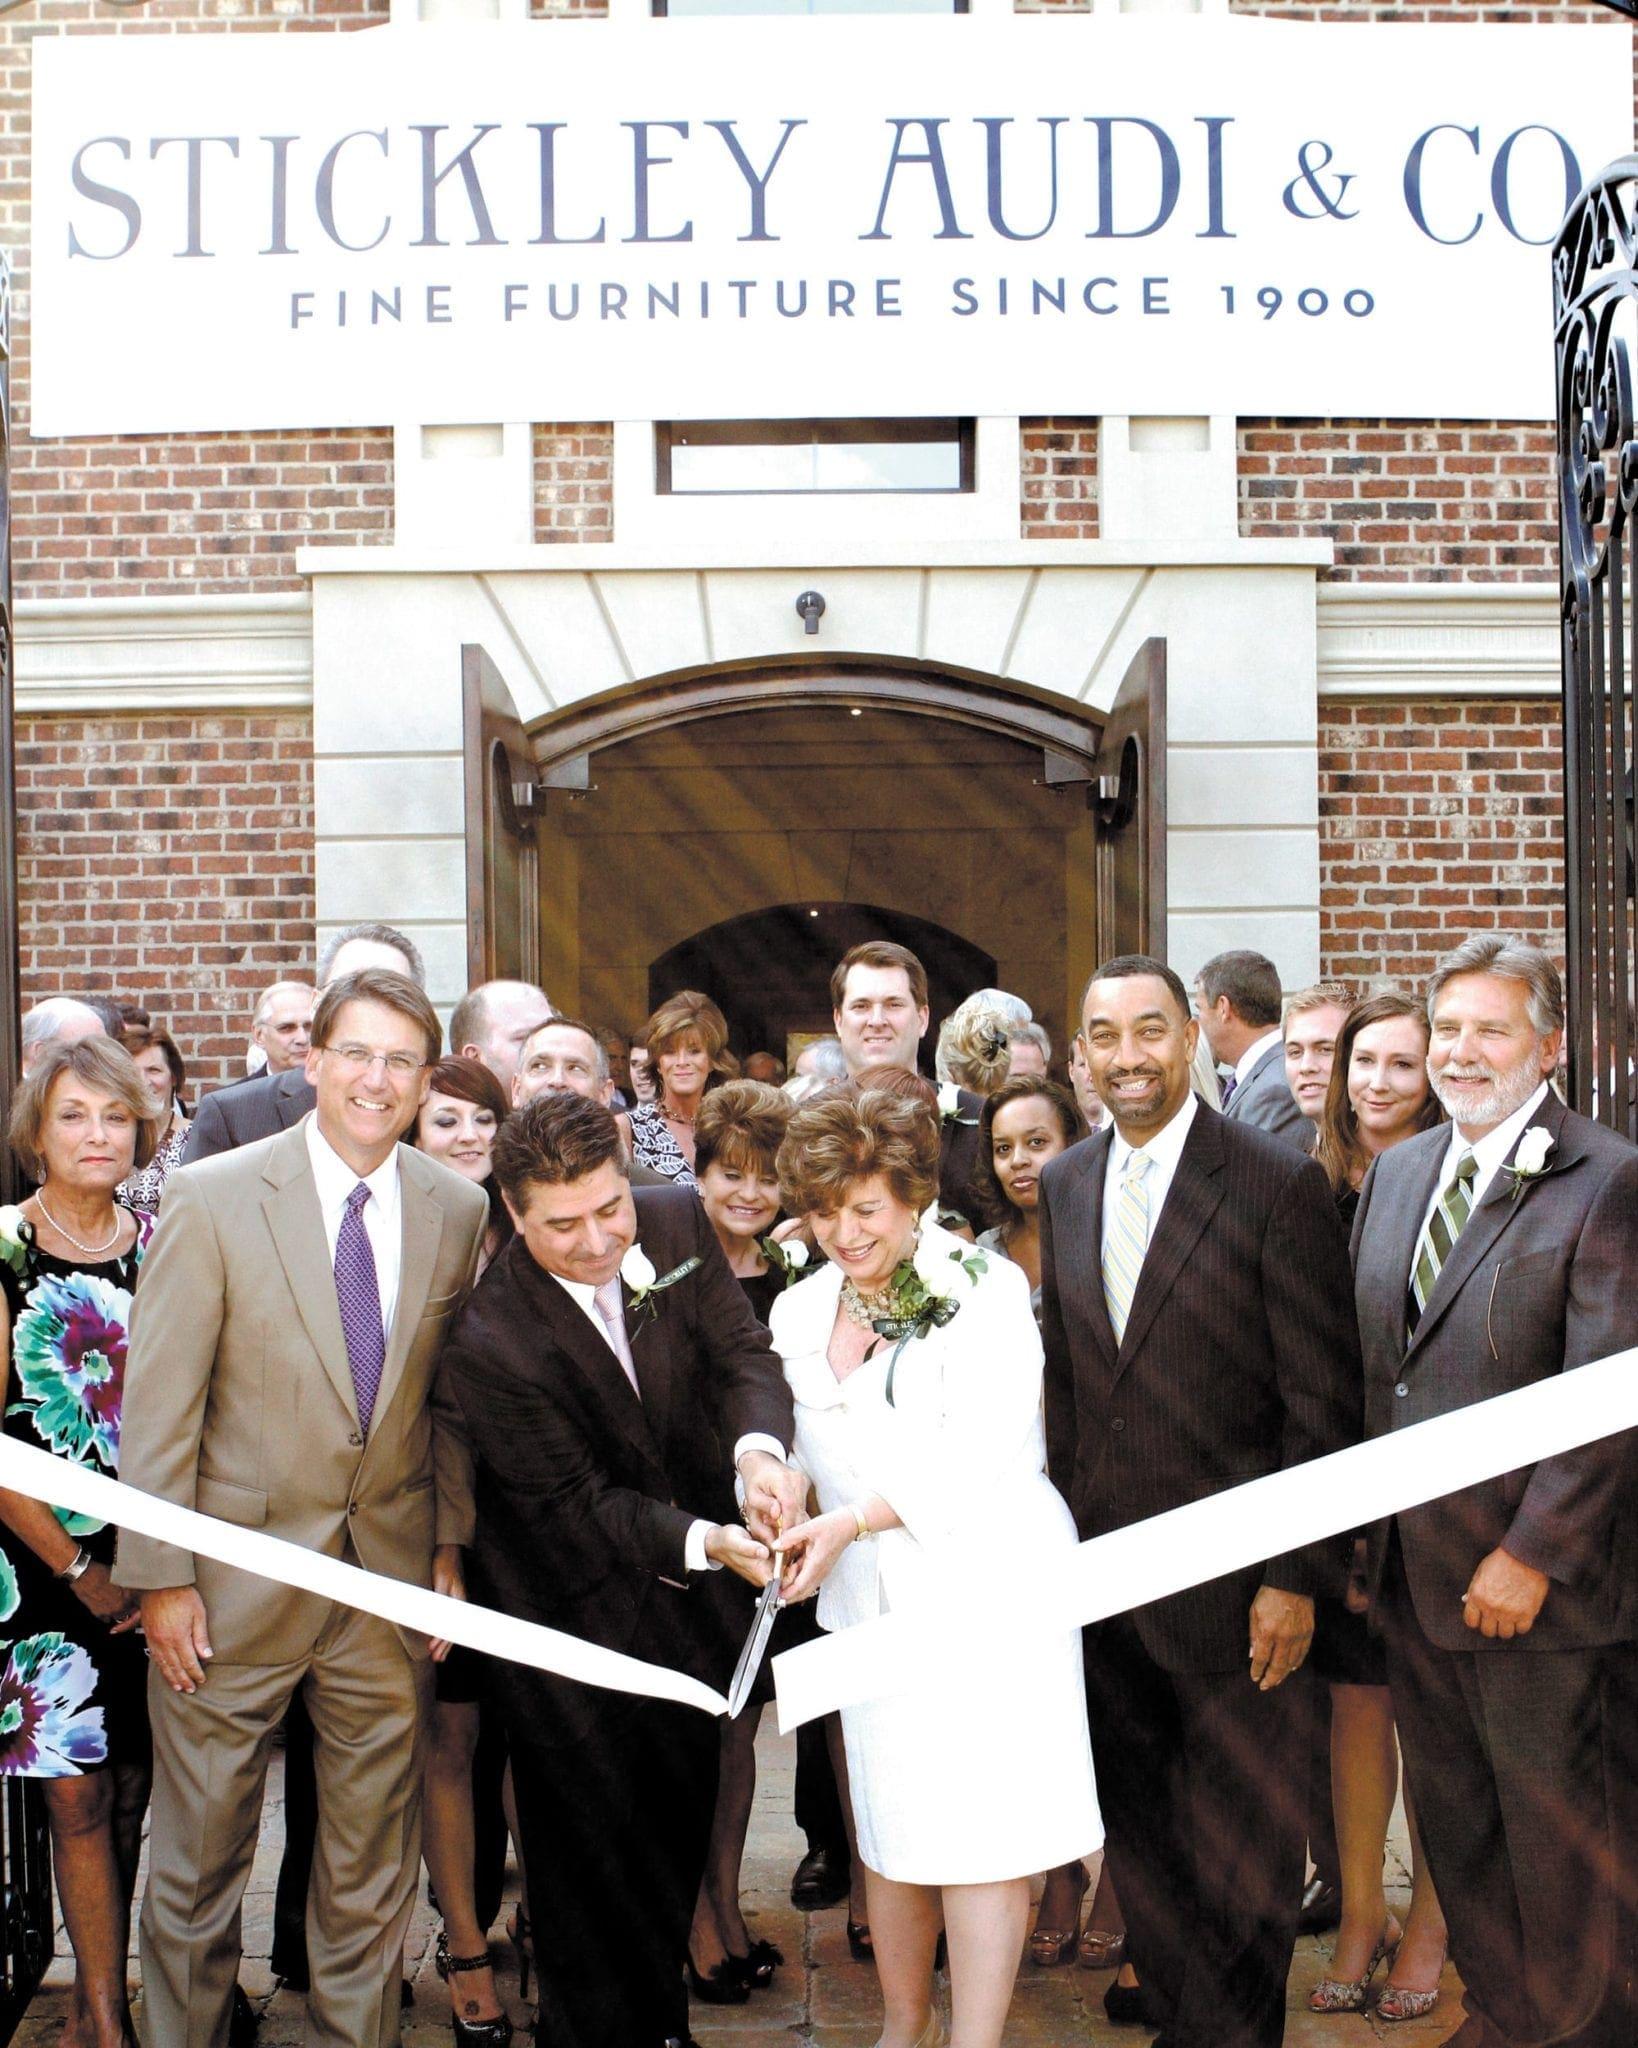 L. & J.G. Stickley: A company on the move